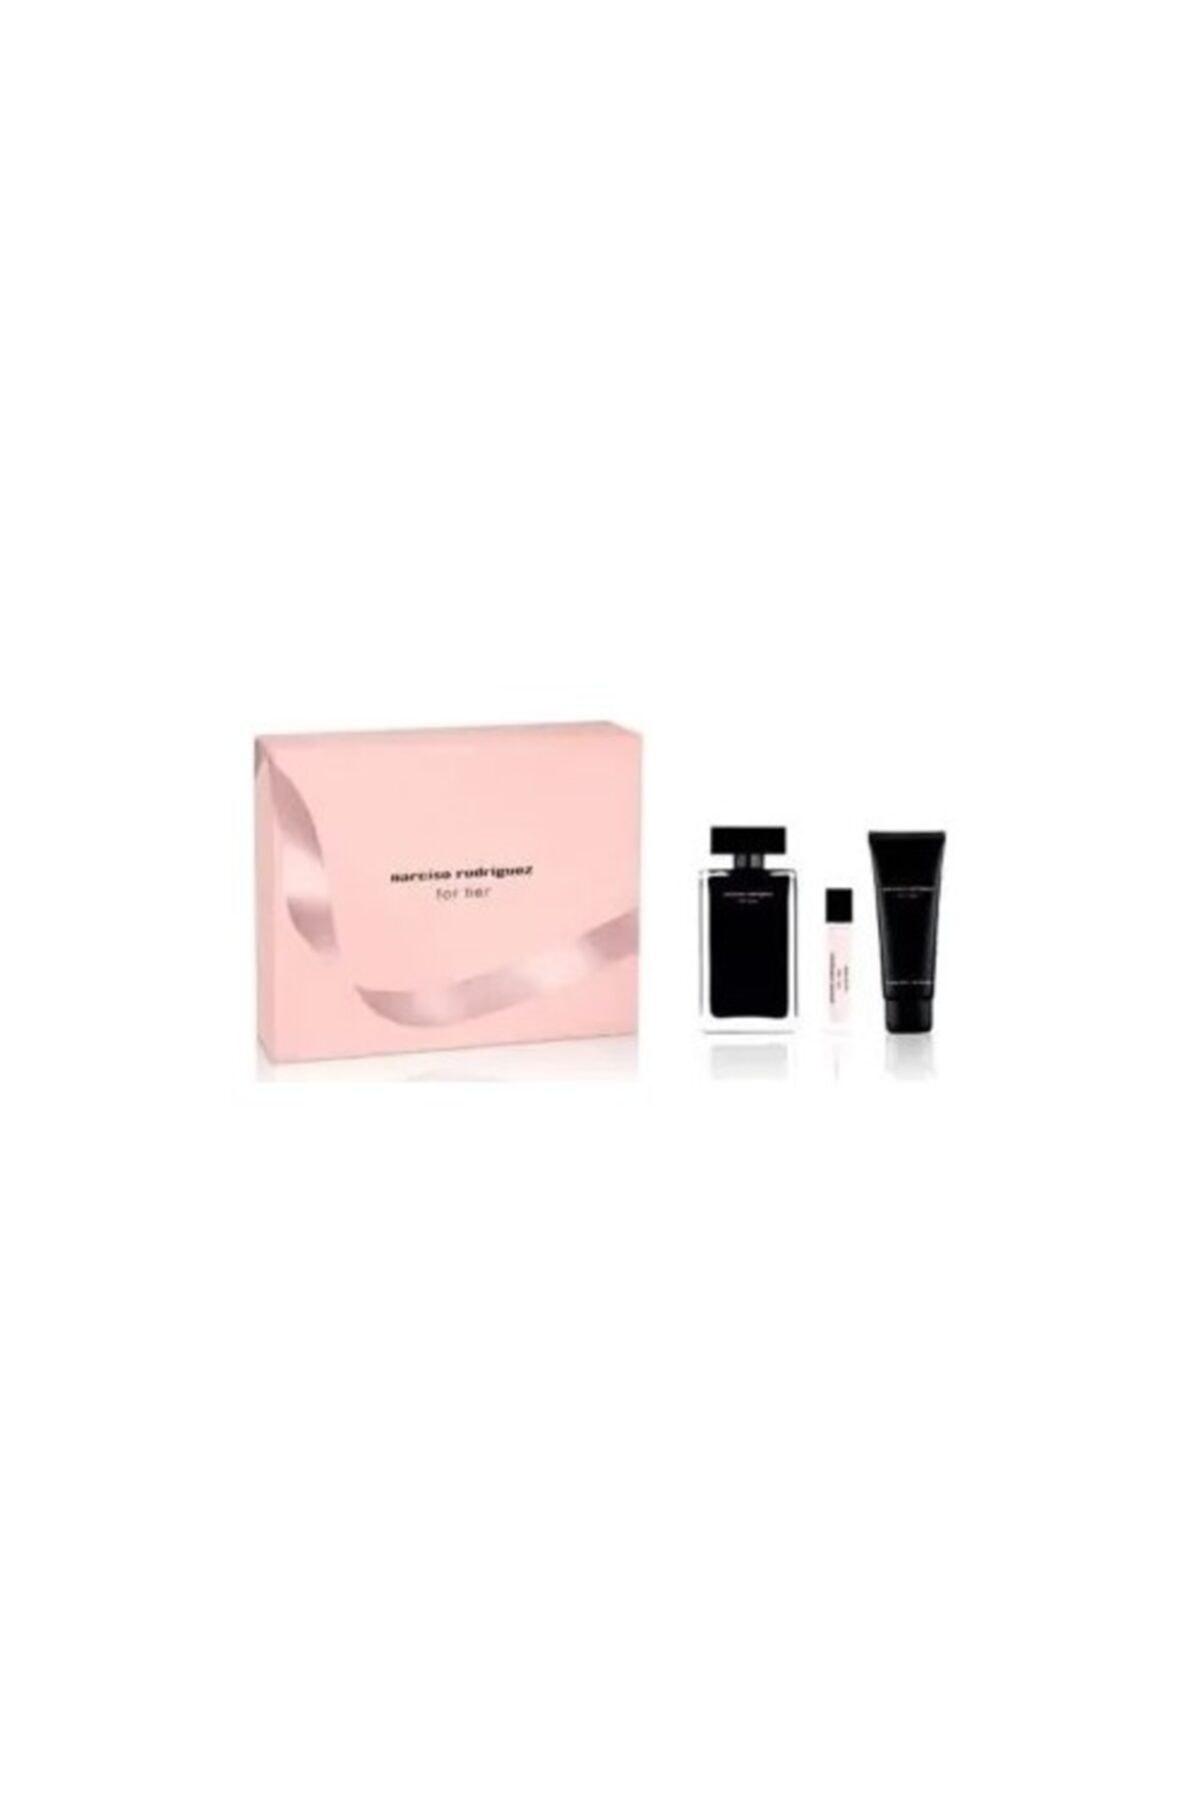 Narciso Rodriguez Edt 100 ml + Body Lotion 75 + Edt 10 Kadın Parfüm Seti 3423478464056 1